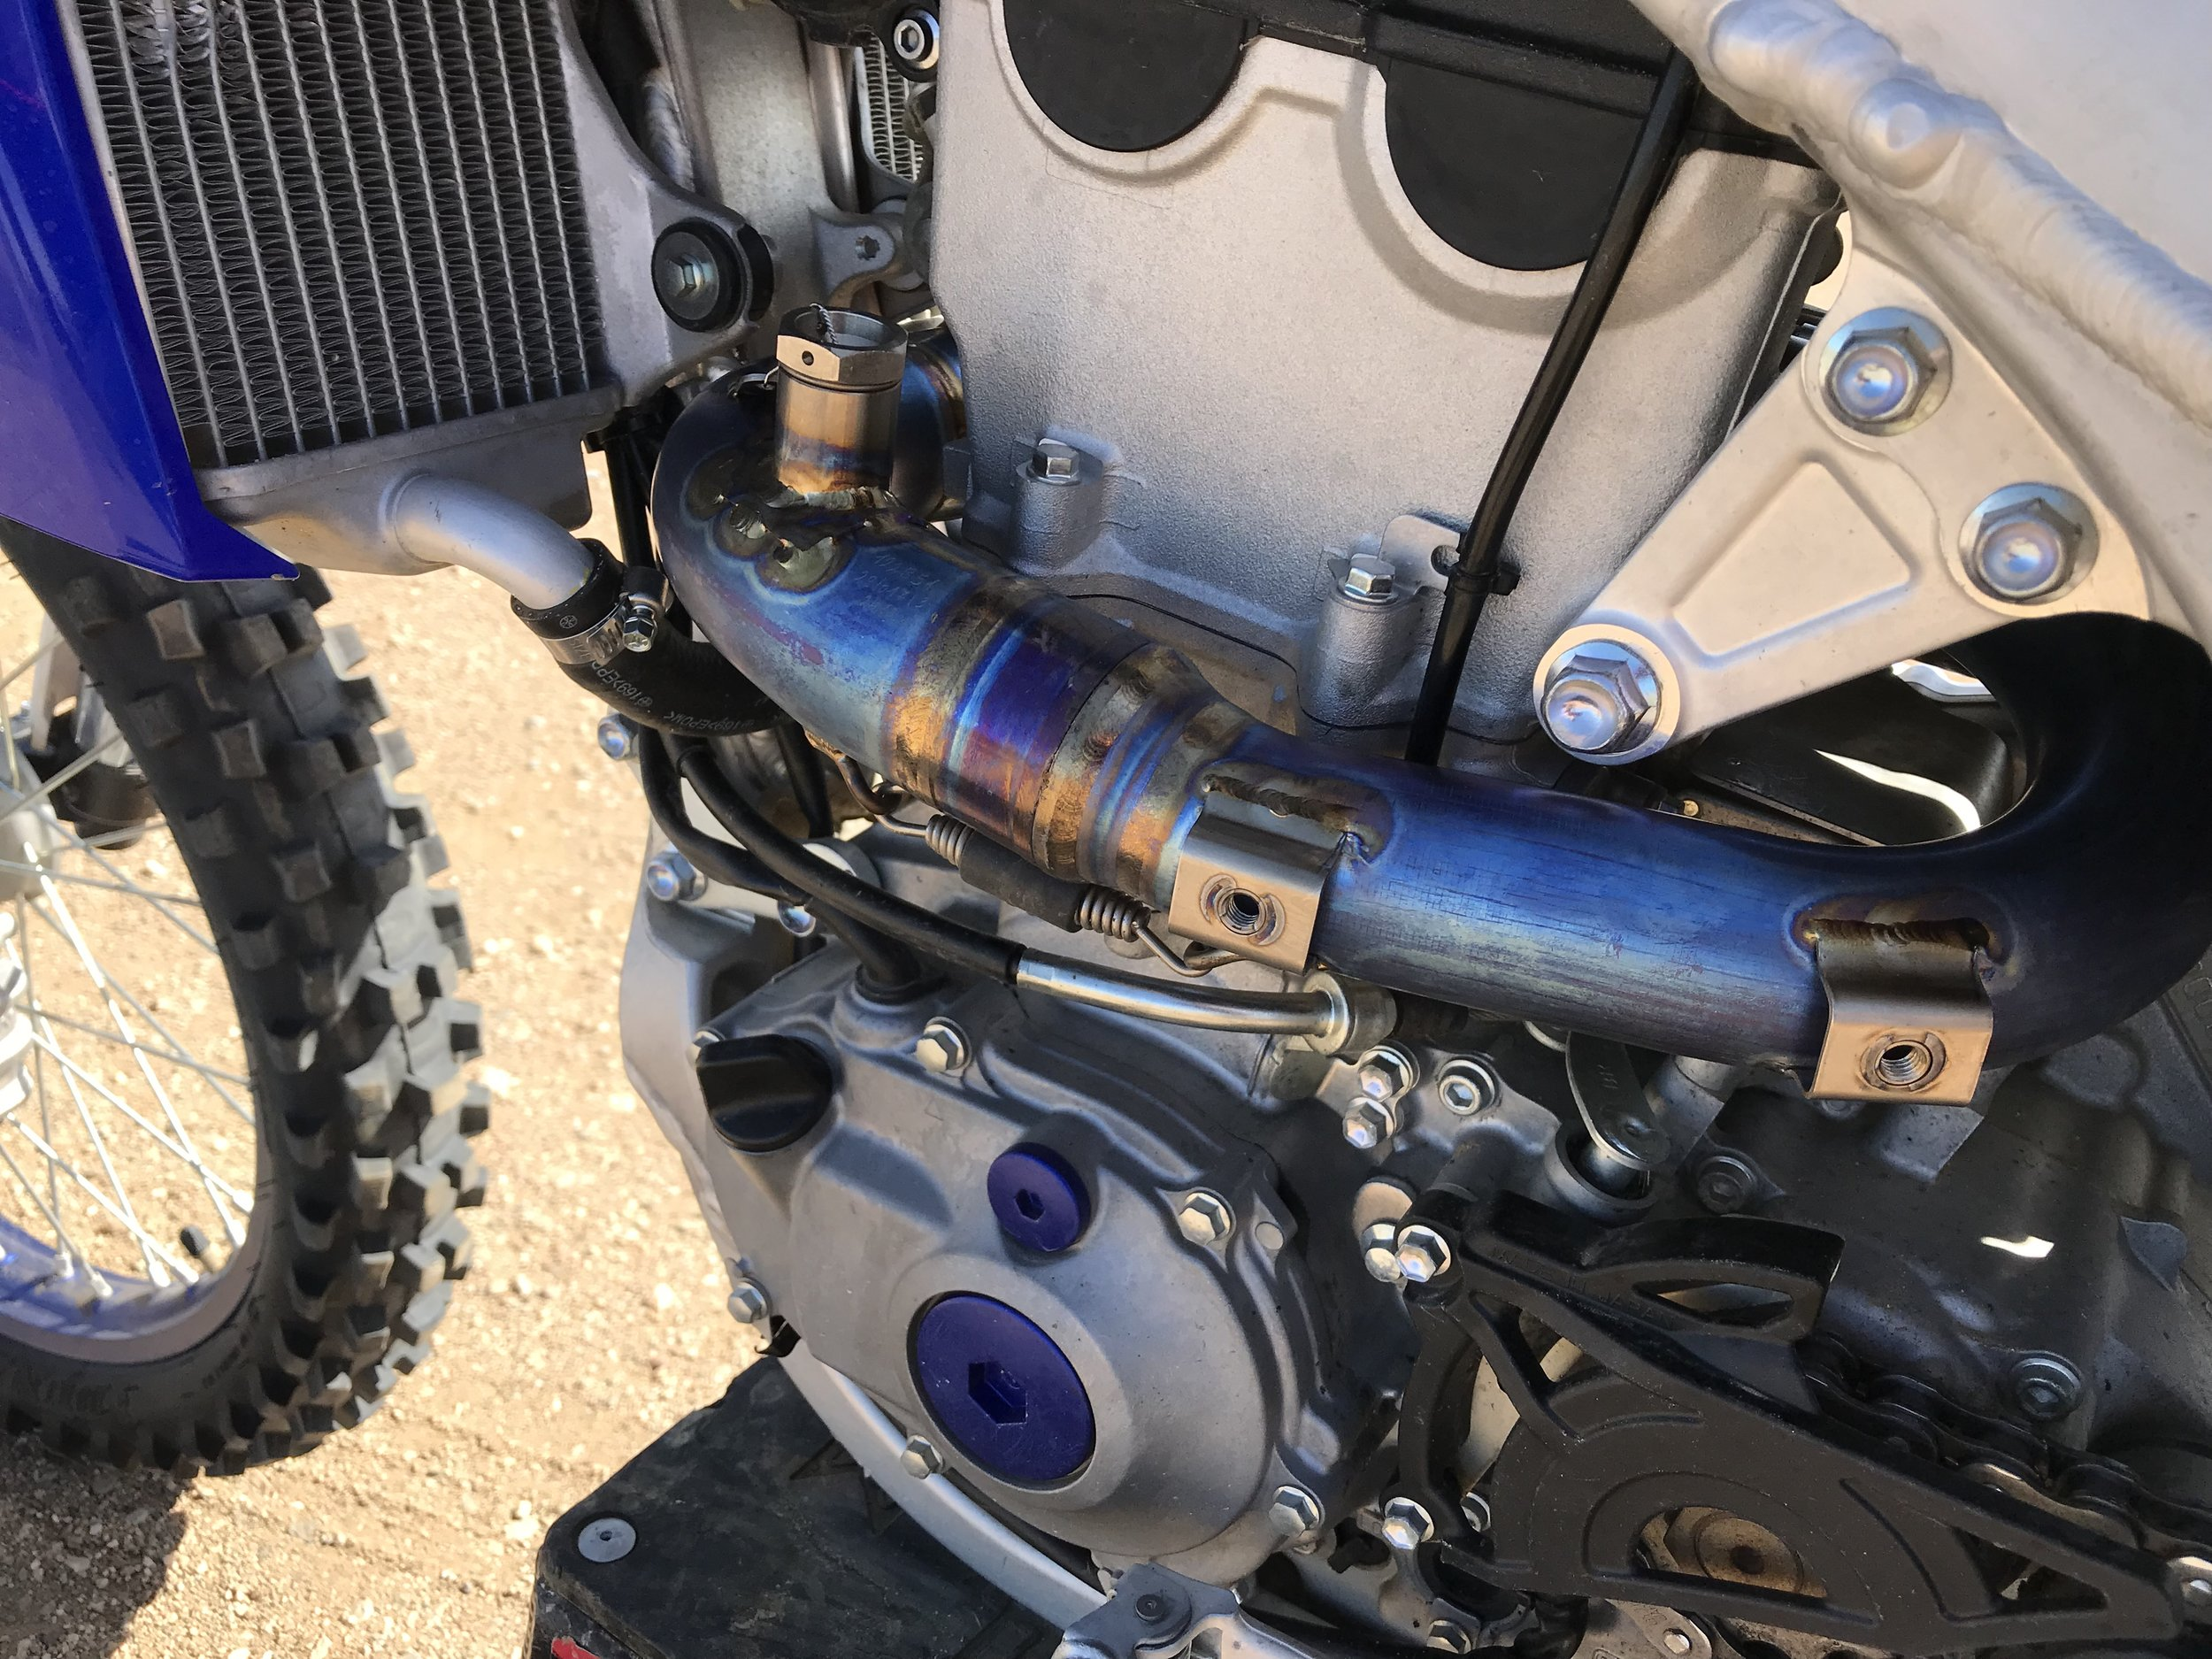 The Akrapovic accepts the use of Yamaha's stock heat shields.